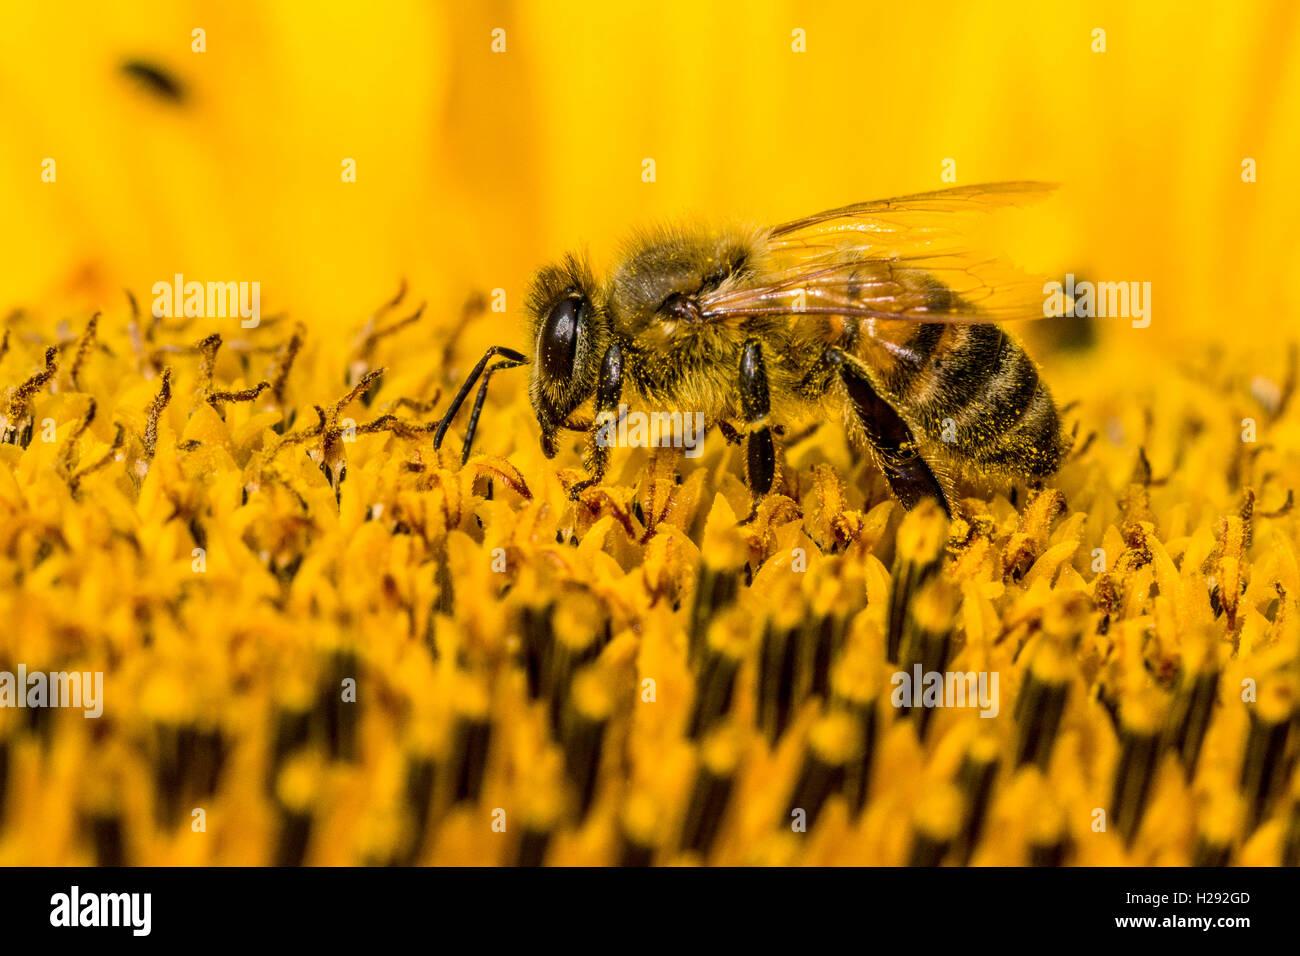 Carniolan de abejas (Apis mellifera Carnica) está recogiendo néctar en un común de girasol (Helianthus annuus) Flor, Sajonia Foto de stock